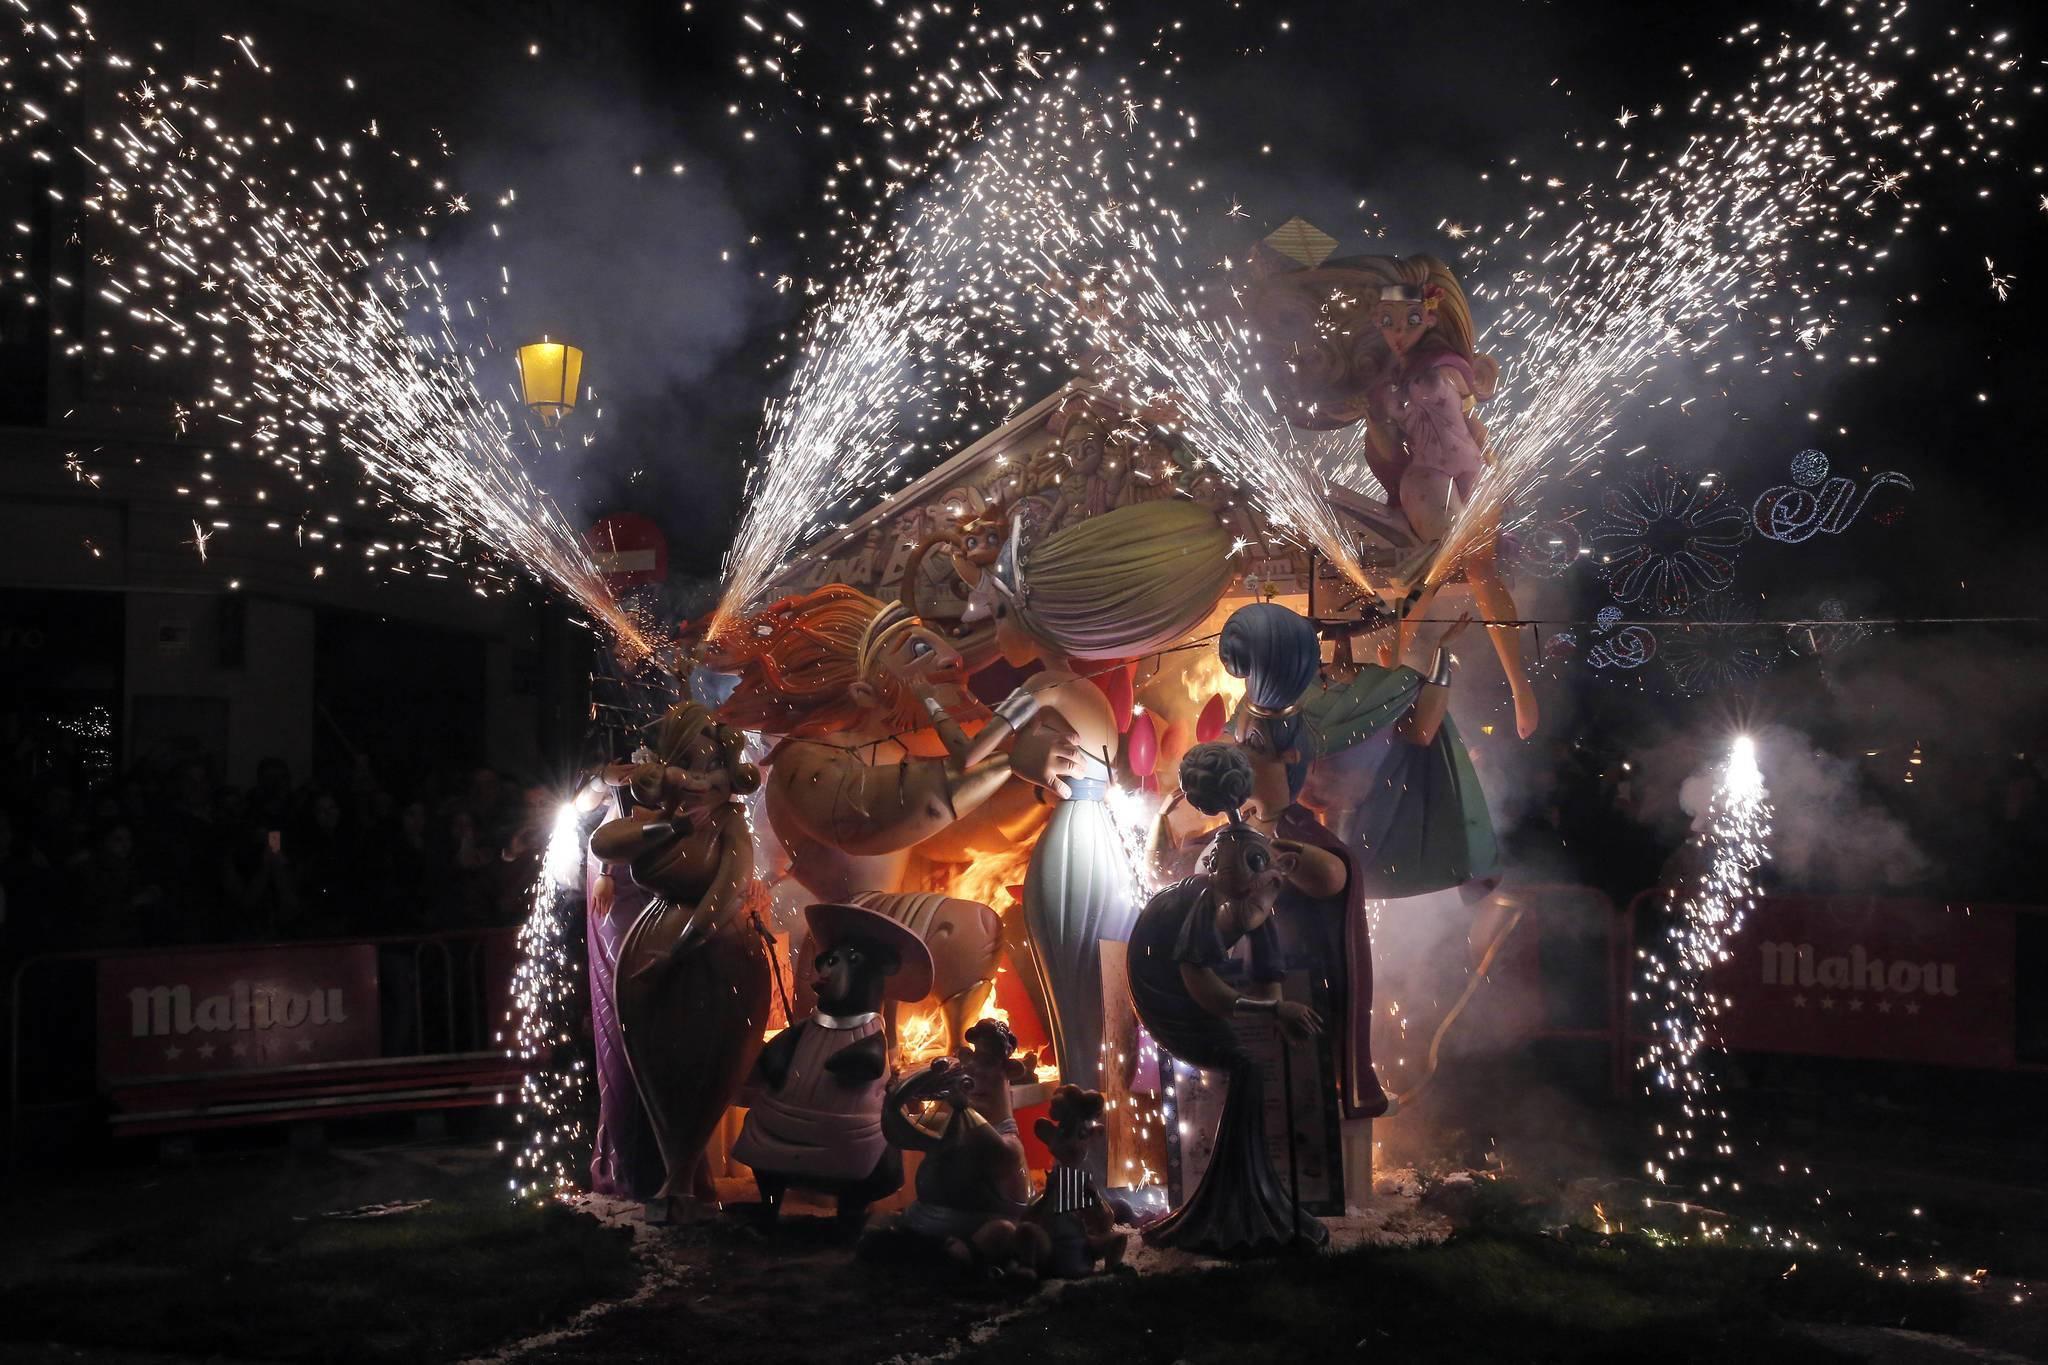 Праздник «мавры и христиане» в испании: дань истории и традициям. испания по-русски - все о жизни в испании